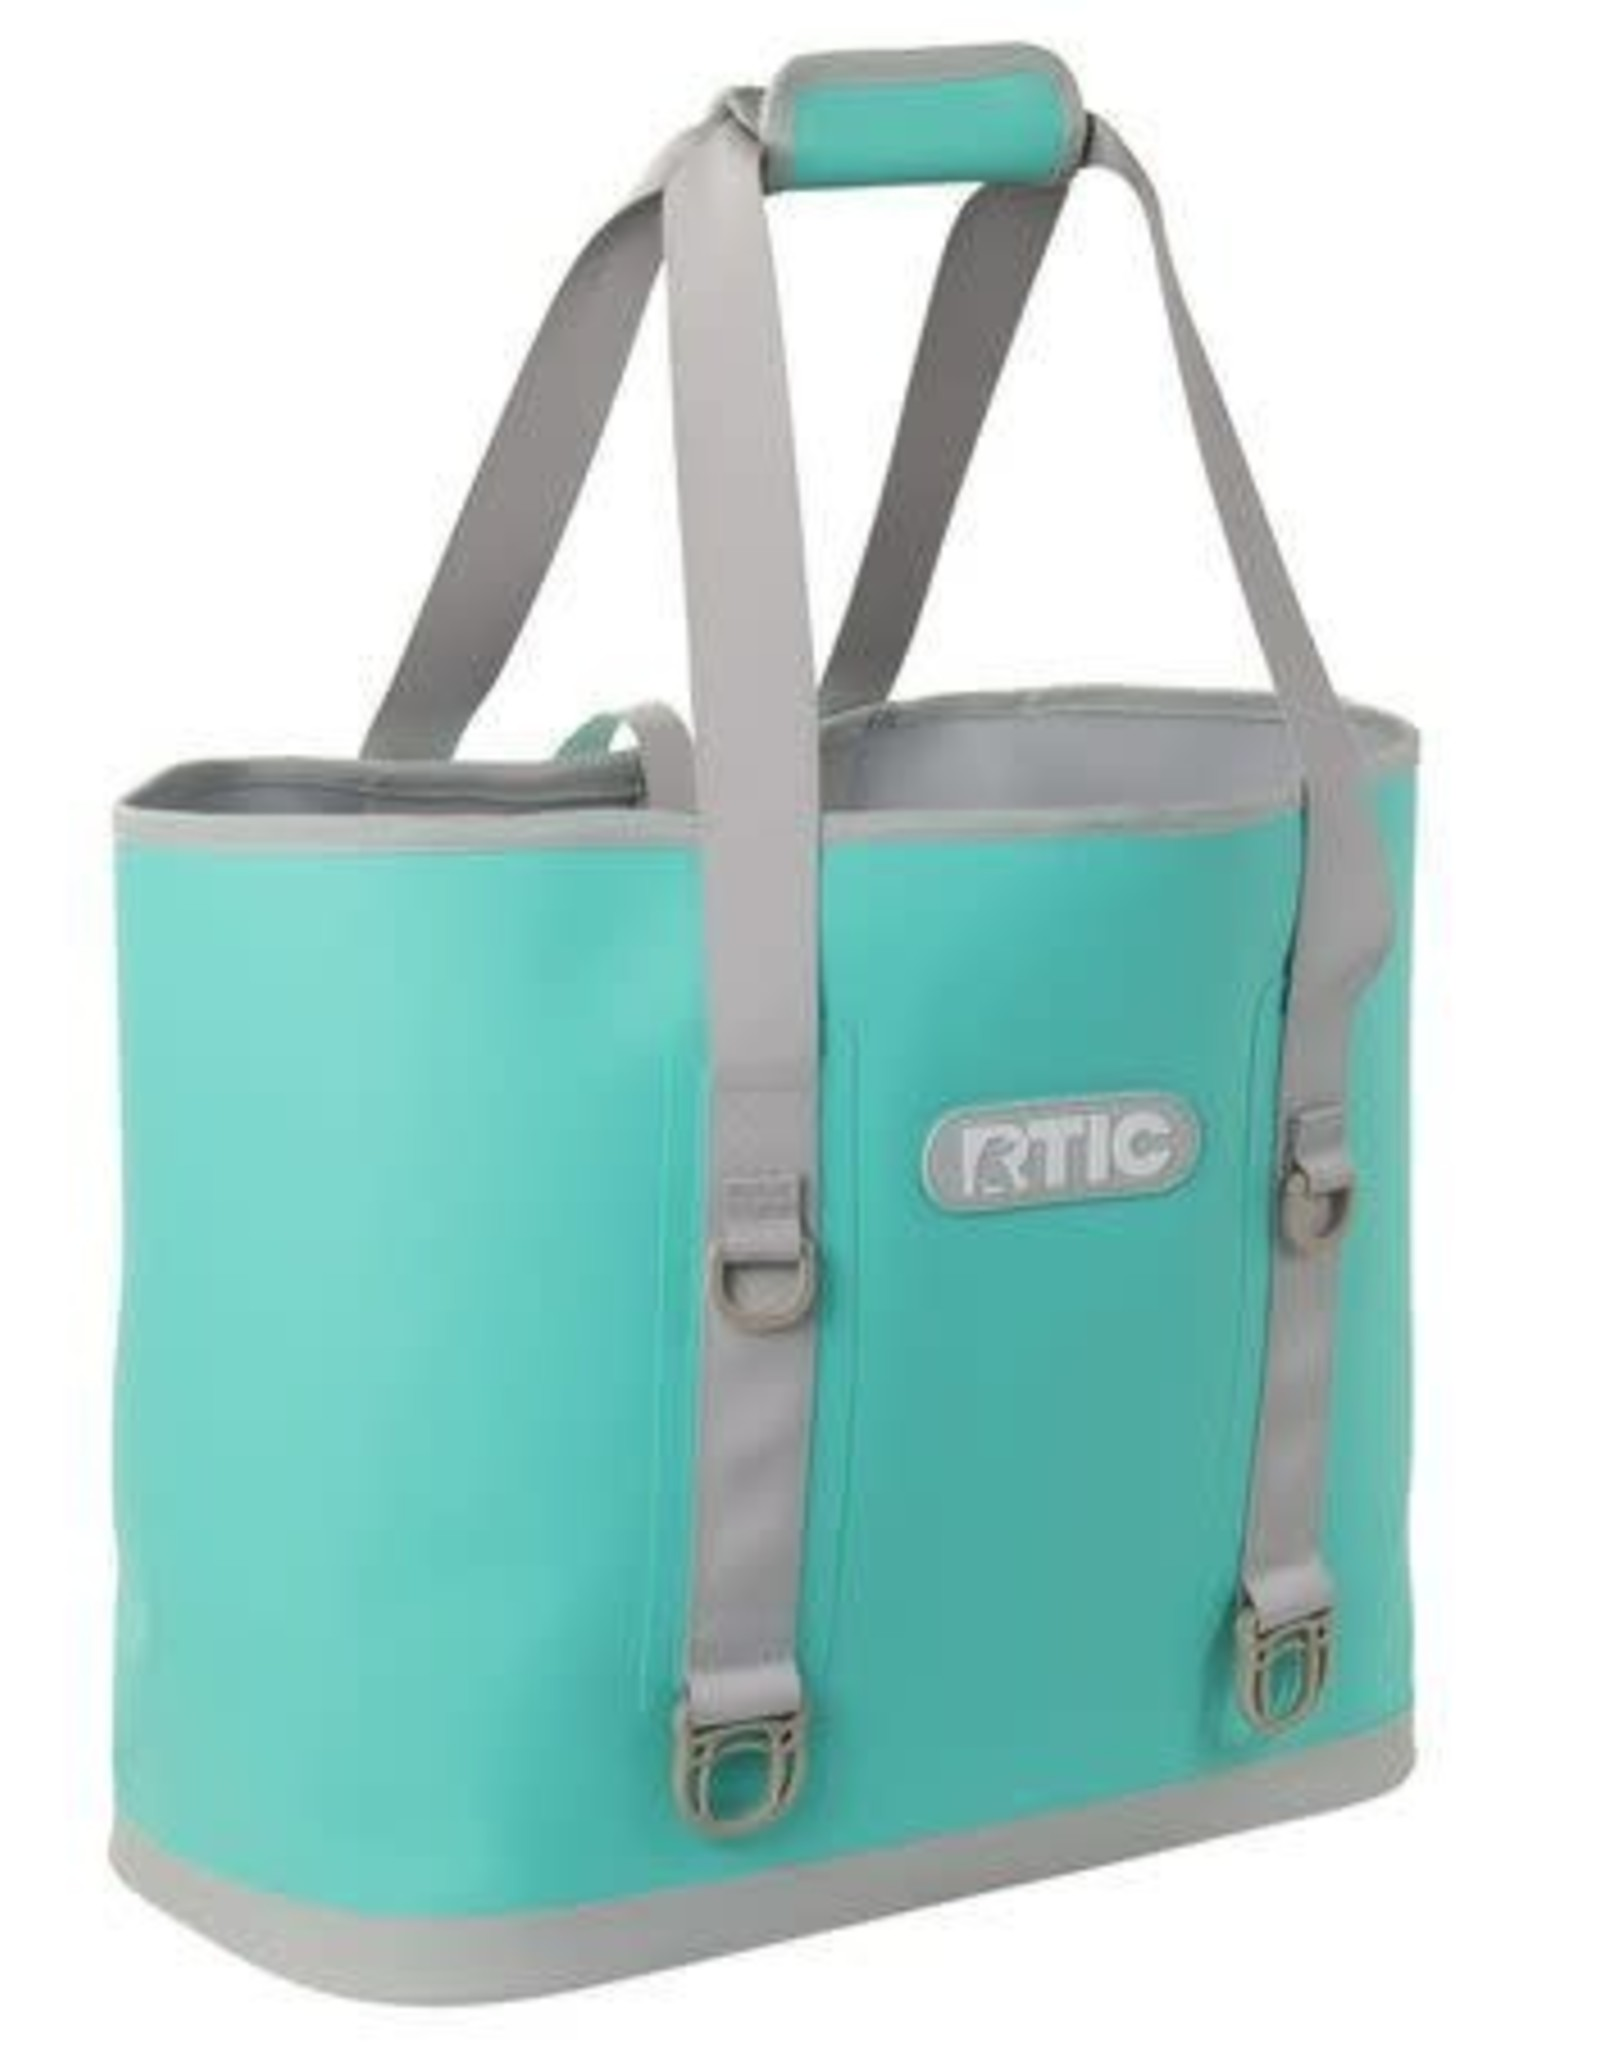 RTIC RTIC Tote Bag Large Seafoam